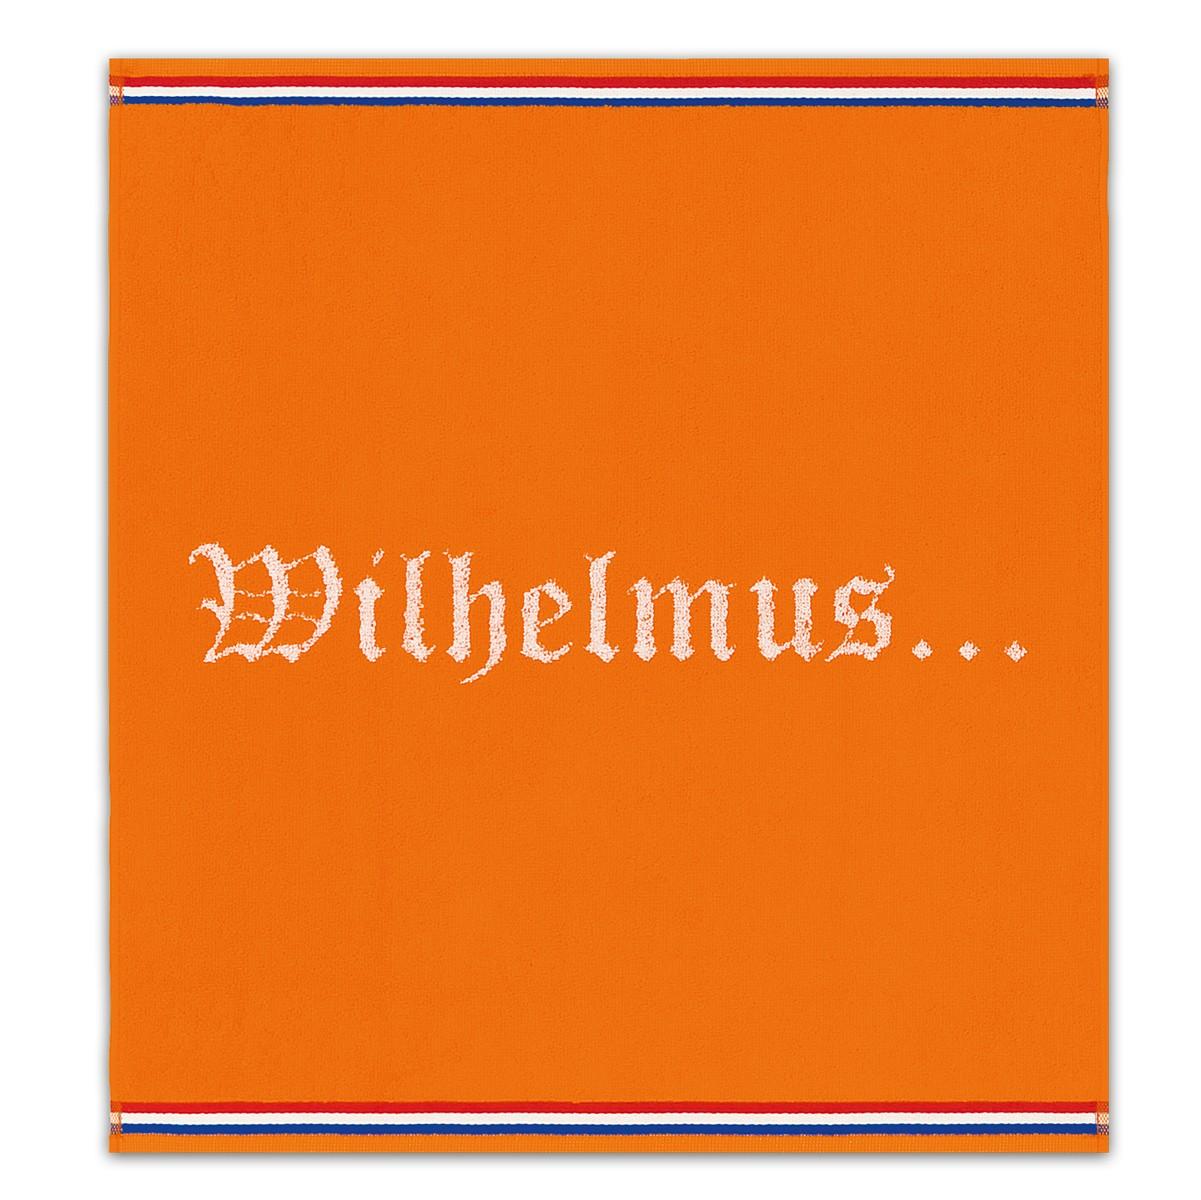 Keukendoek Wilhelmus | Orange | 60 x 65 cm